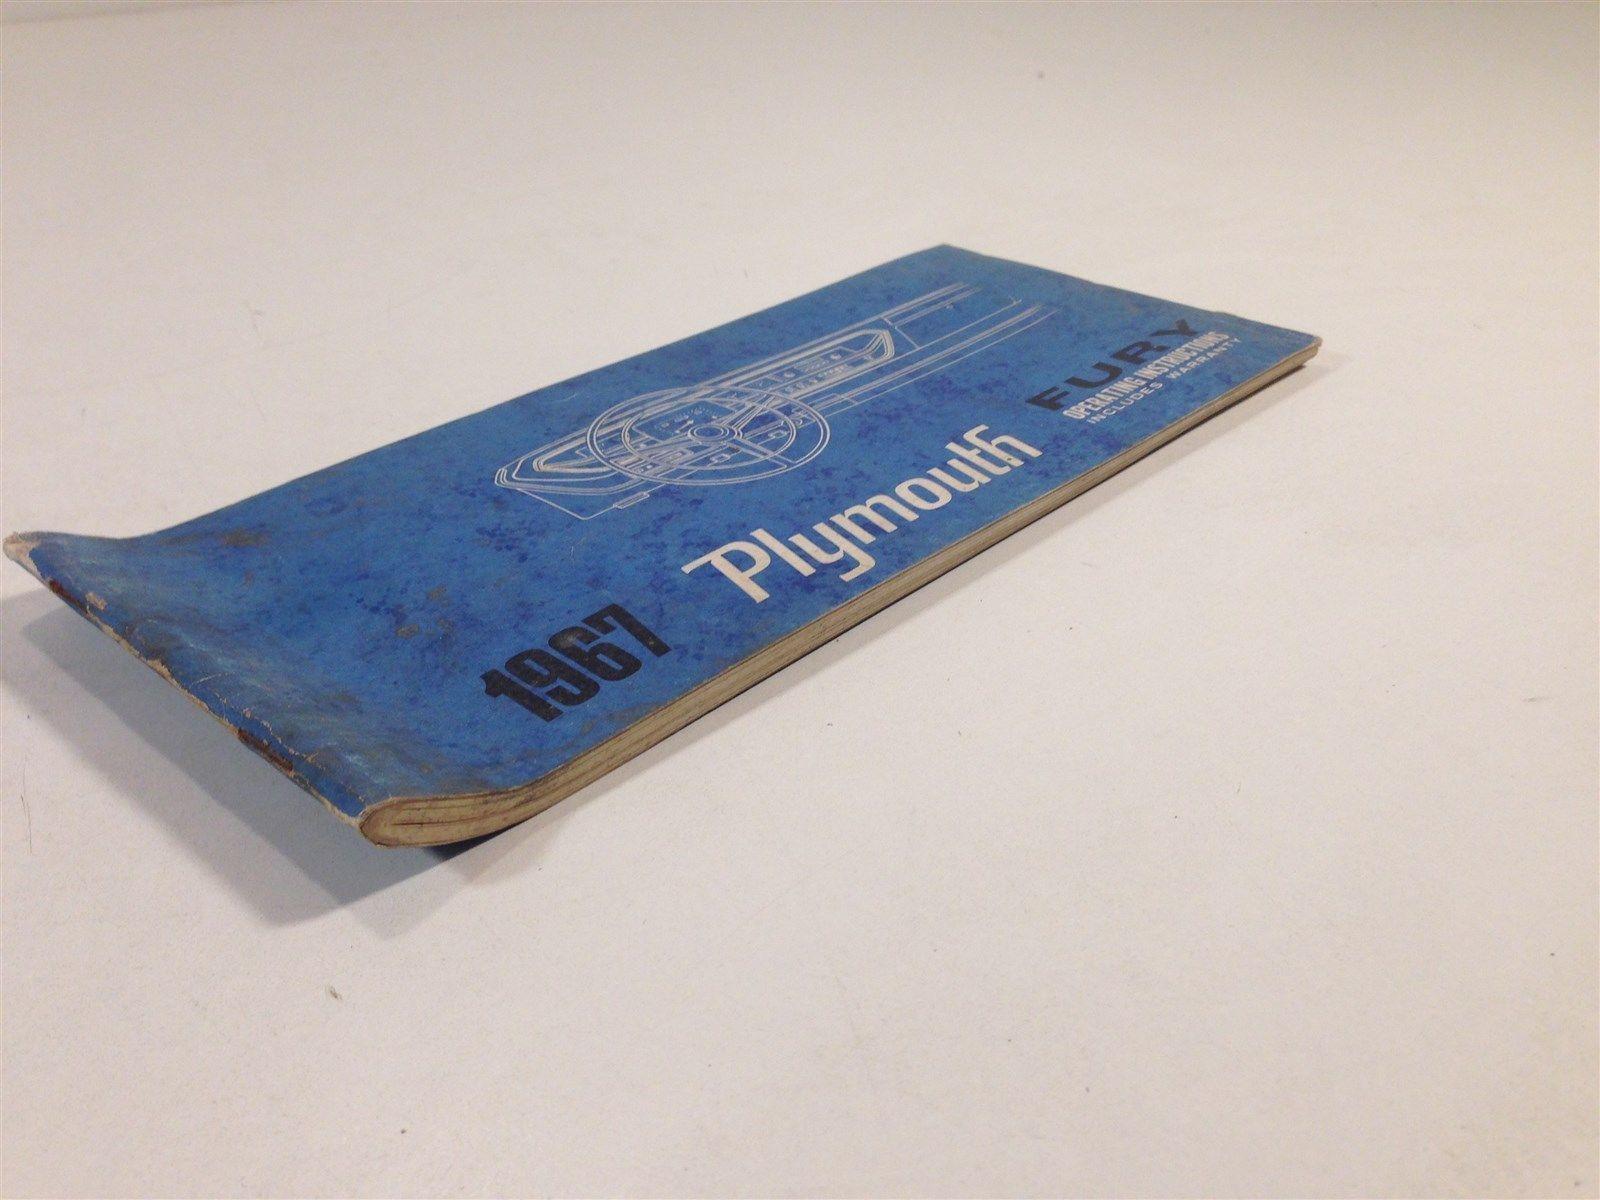 1967 Plymouth Fury Operating Instructions Warranty 81-570-7455 Glove Box